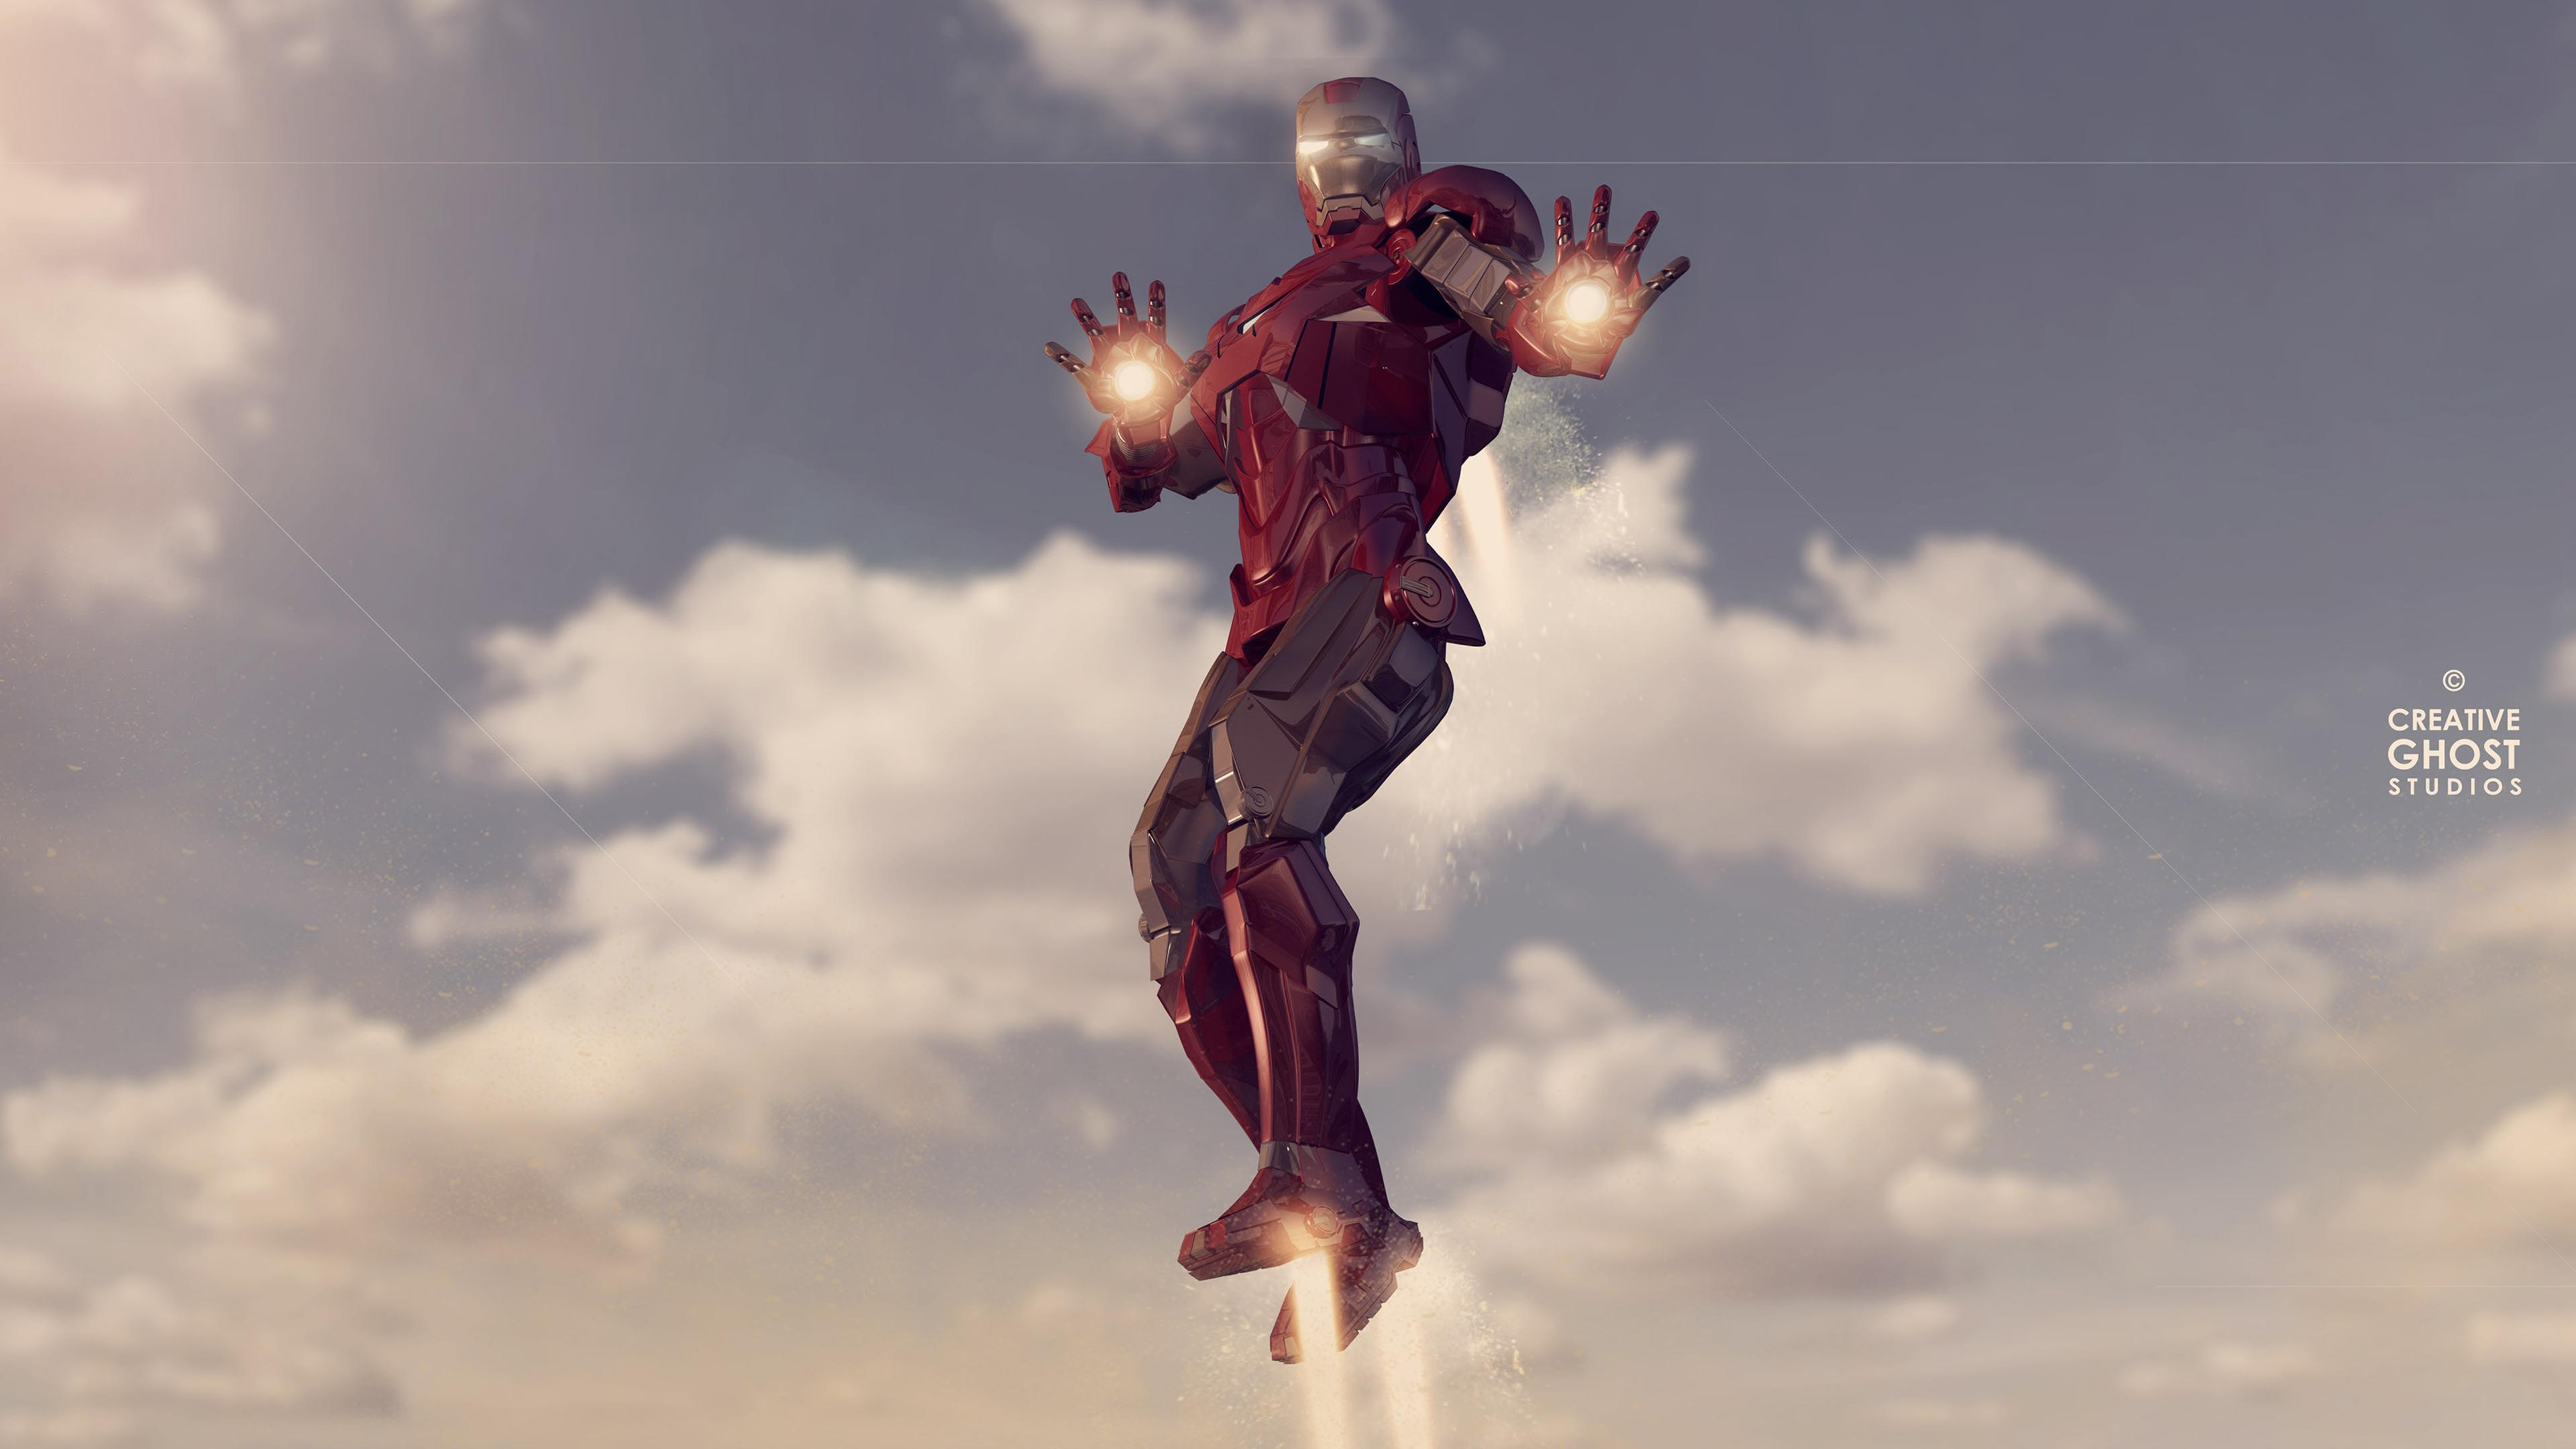 iron man 4k new digital artwork 1562105693 - Iron Man 4k New Digital Artwork - superheroes wallpapers, iron man wallpapers, hd-wallpapers, digital art wallpapers, behance wallpapers, artwork wallpapers, 4k-wallpapers